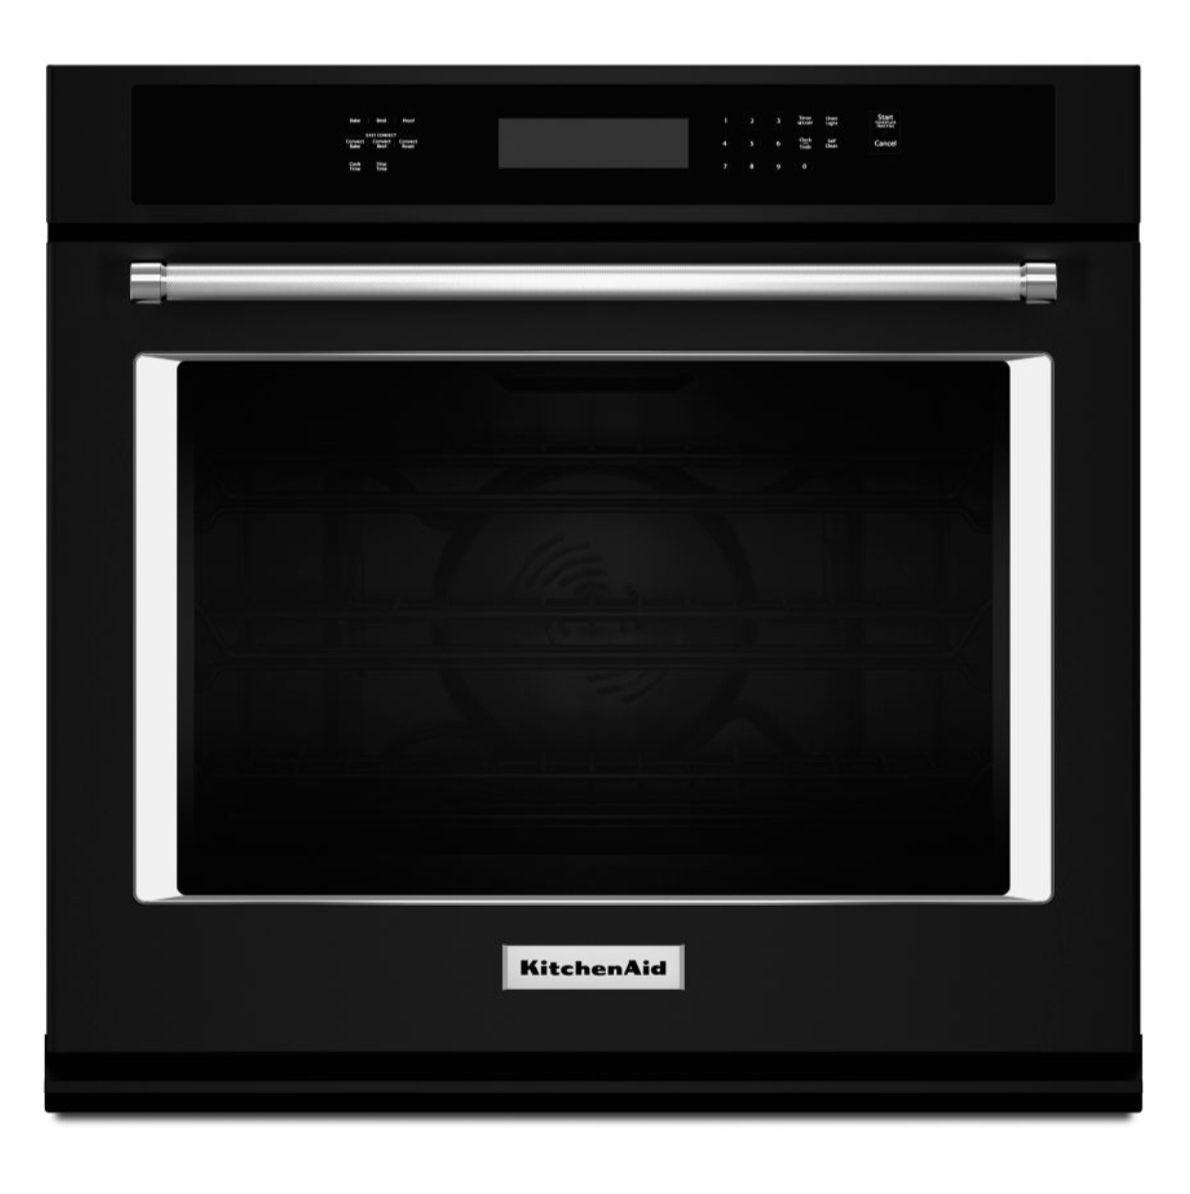 Kitchenaid 30 single wall oven with evenheat true